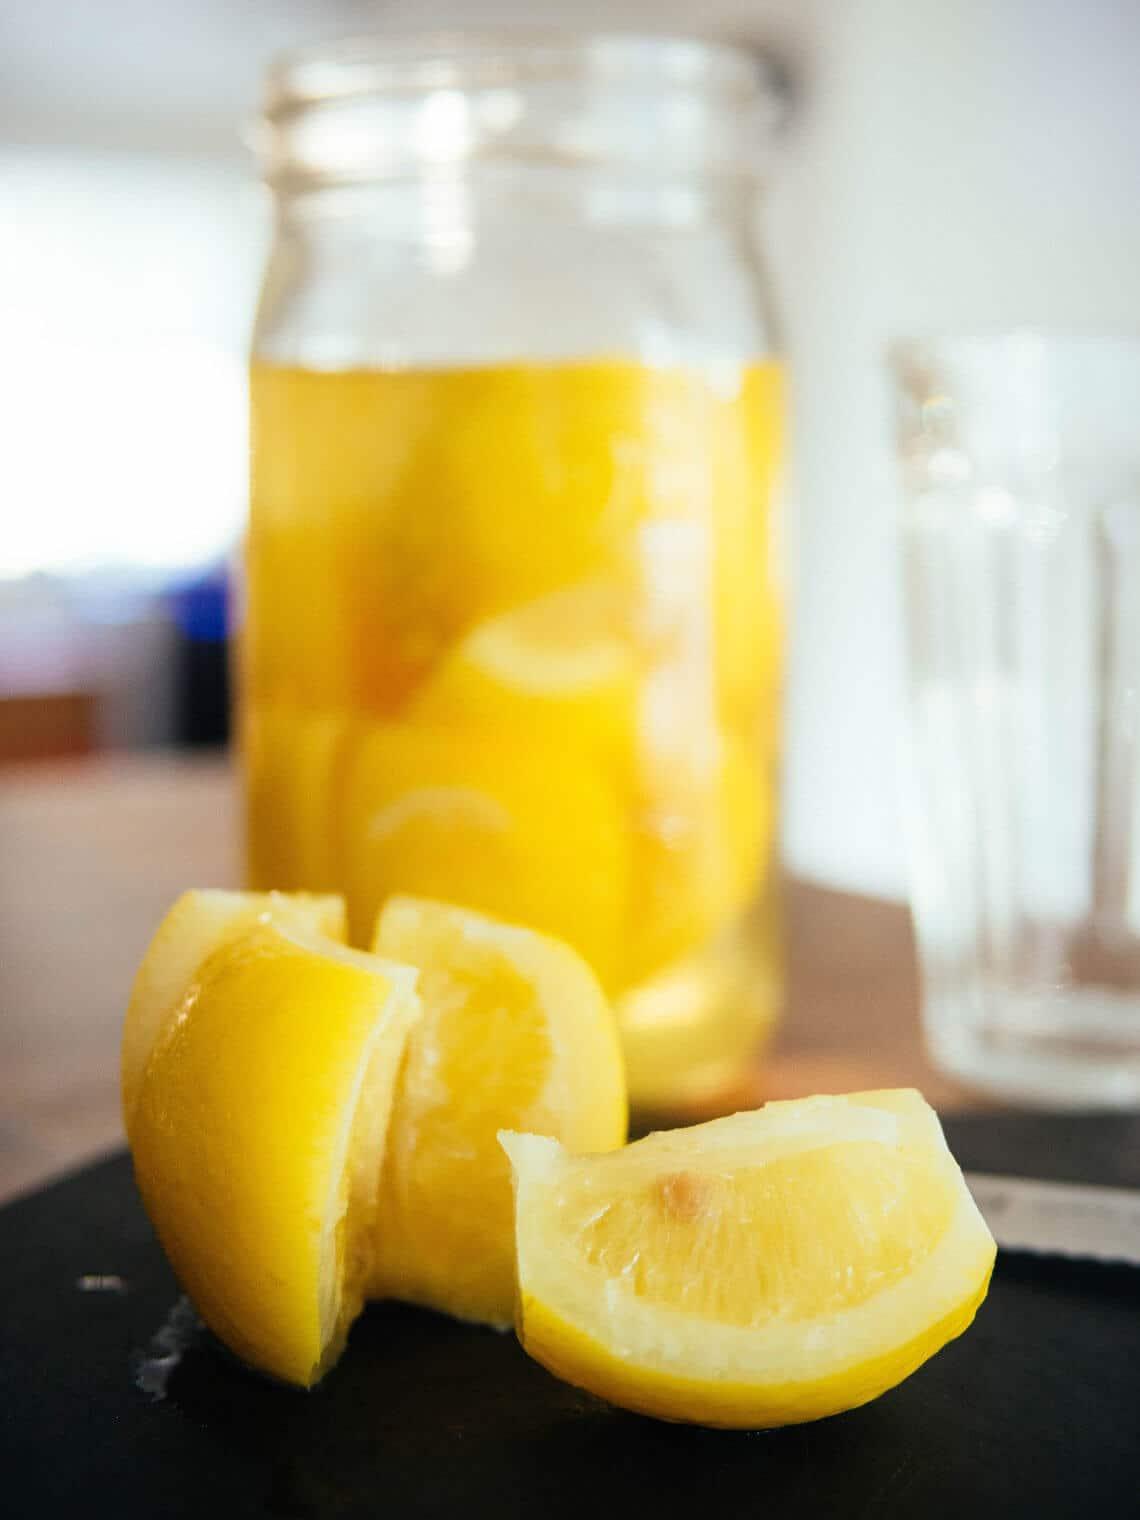 Vietnamese preserved lemons (chanh muoi) and salty lemonade